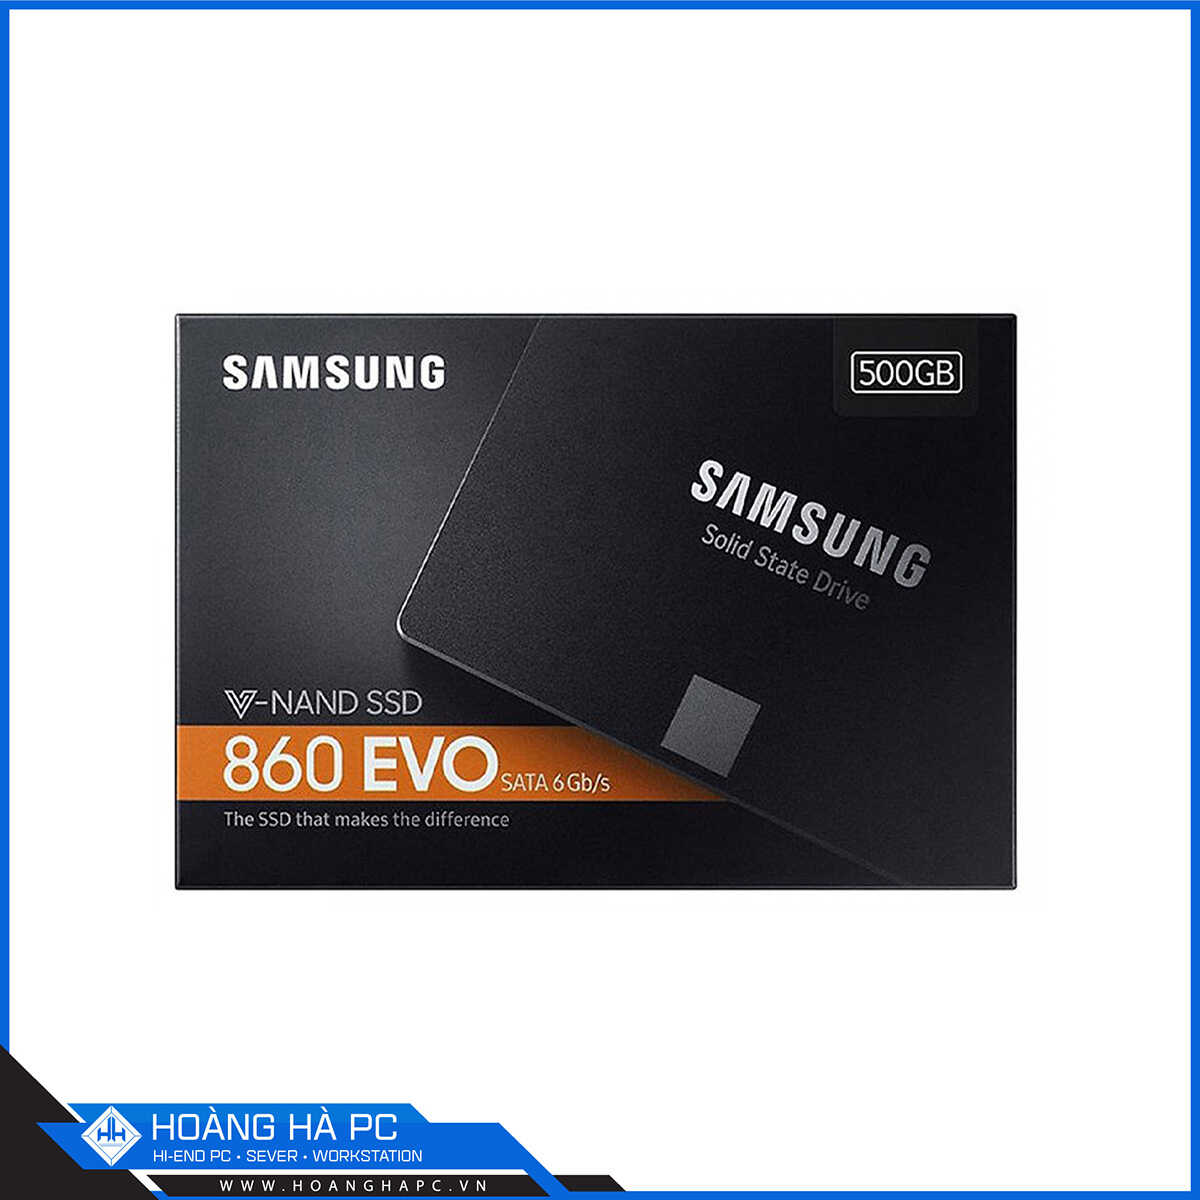 SSD Samsung 860 EVO 500GB